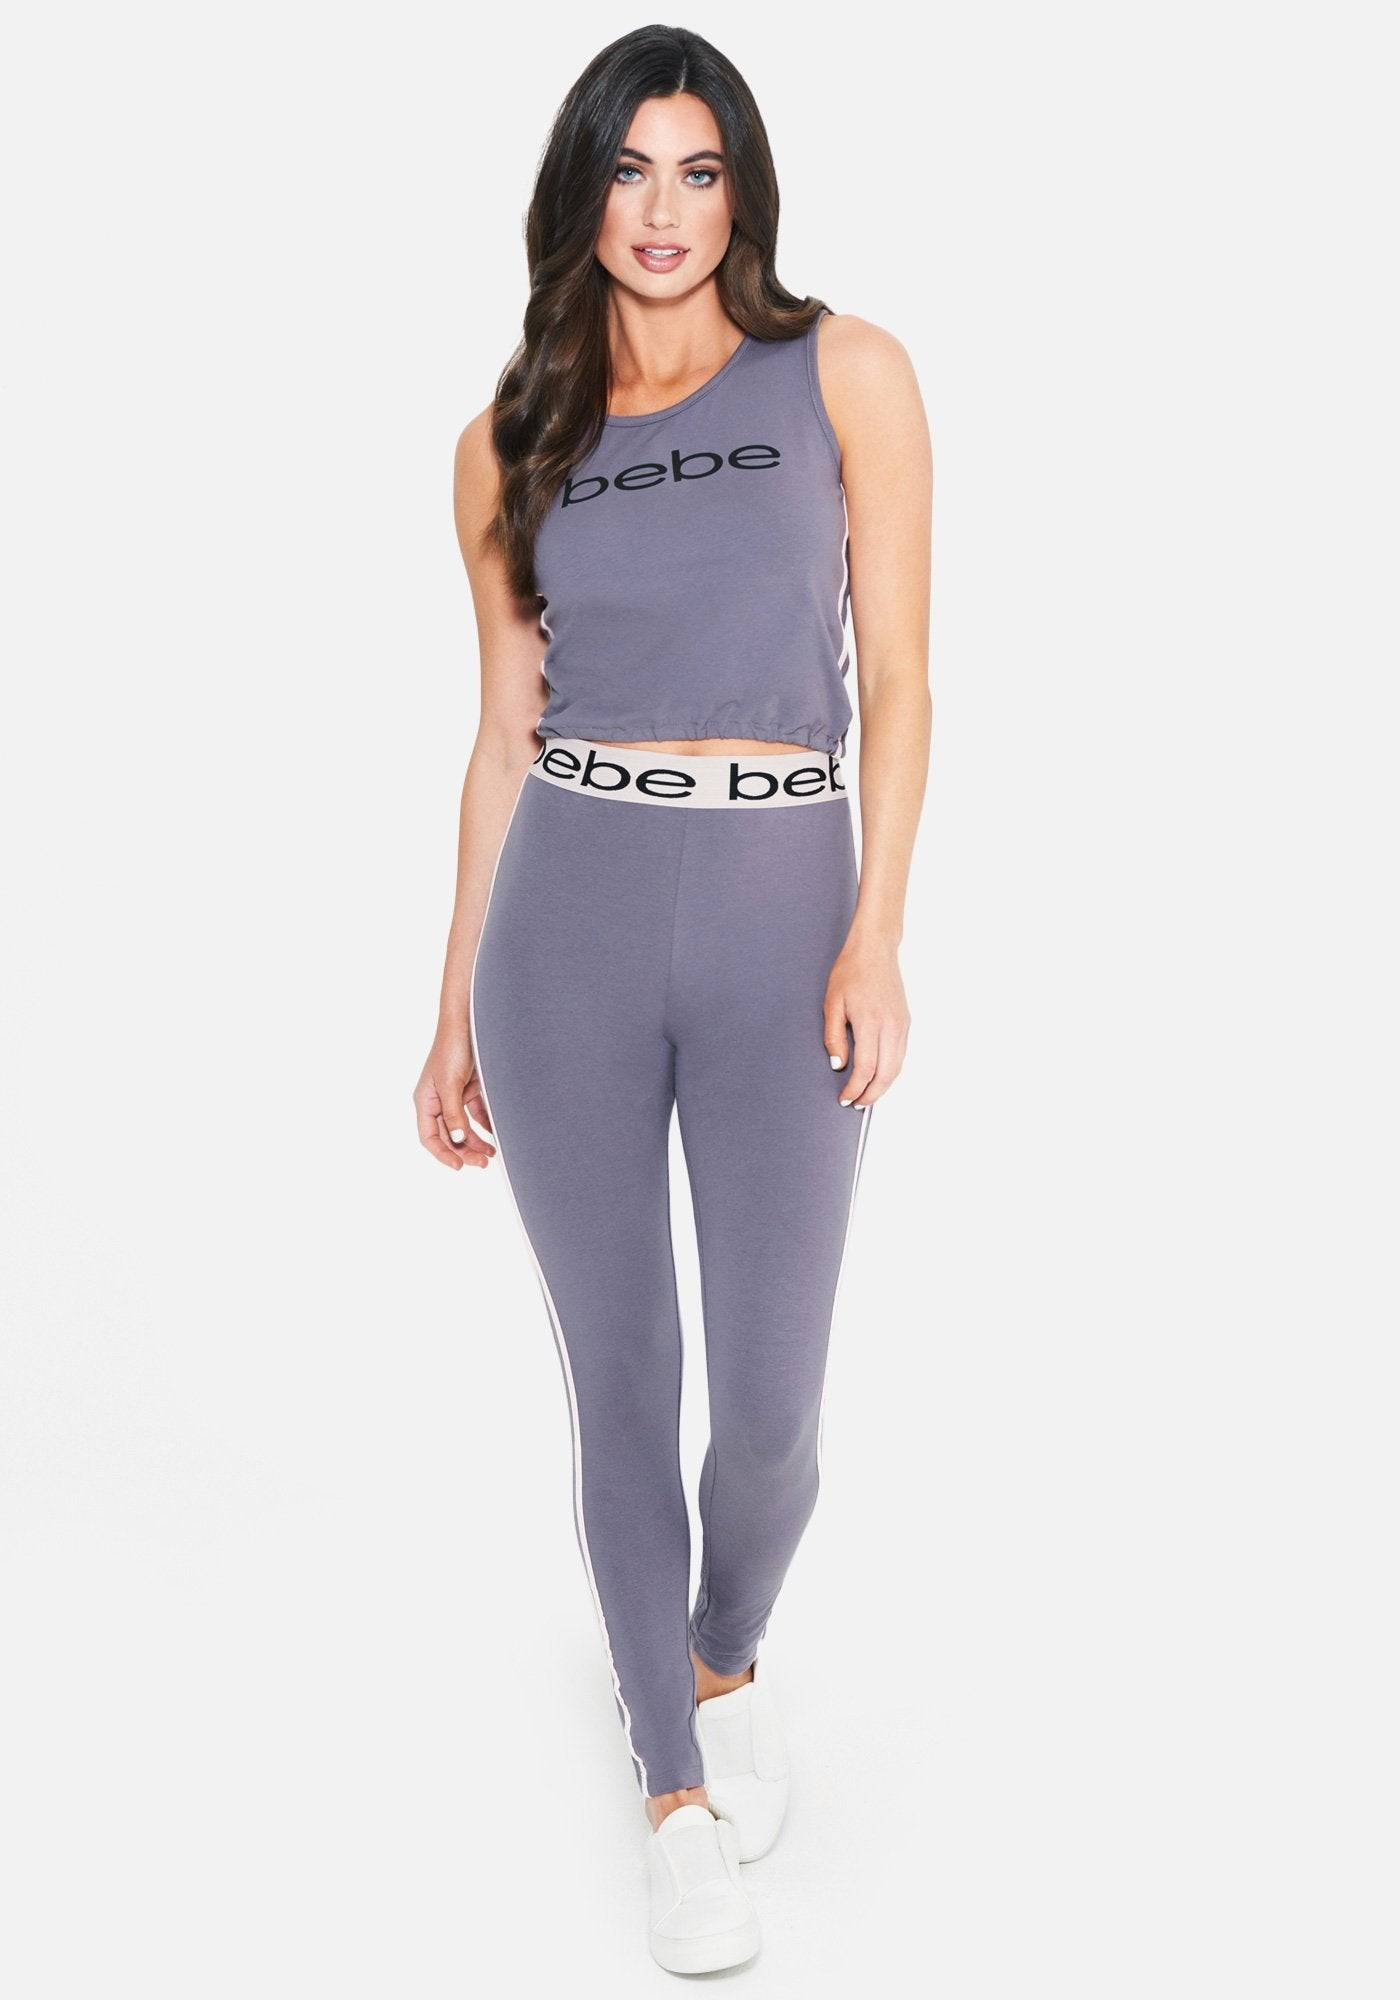 bebe Women's Bebe Logo Crop Tee Shirt Pant Set, Size Medium in Midnight Lavendar Cotton/Spandex